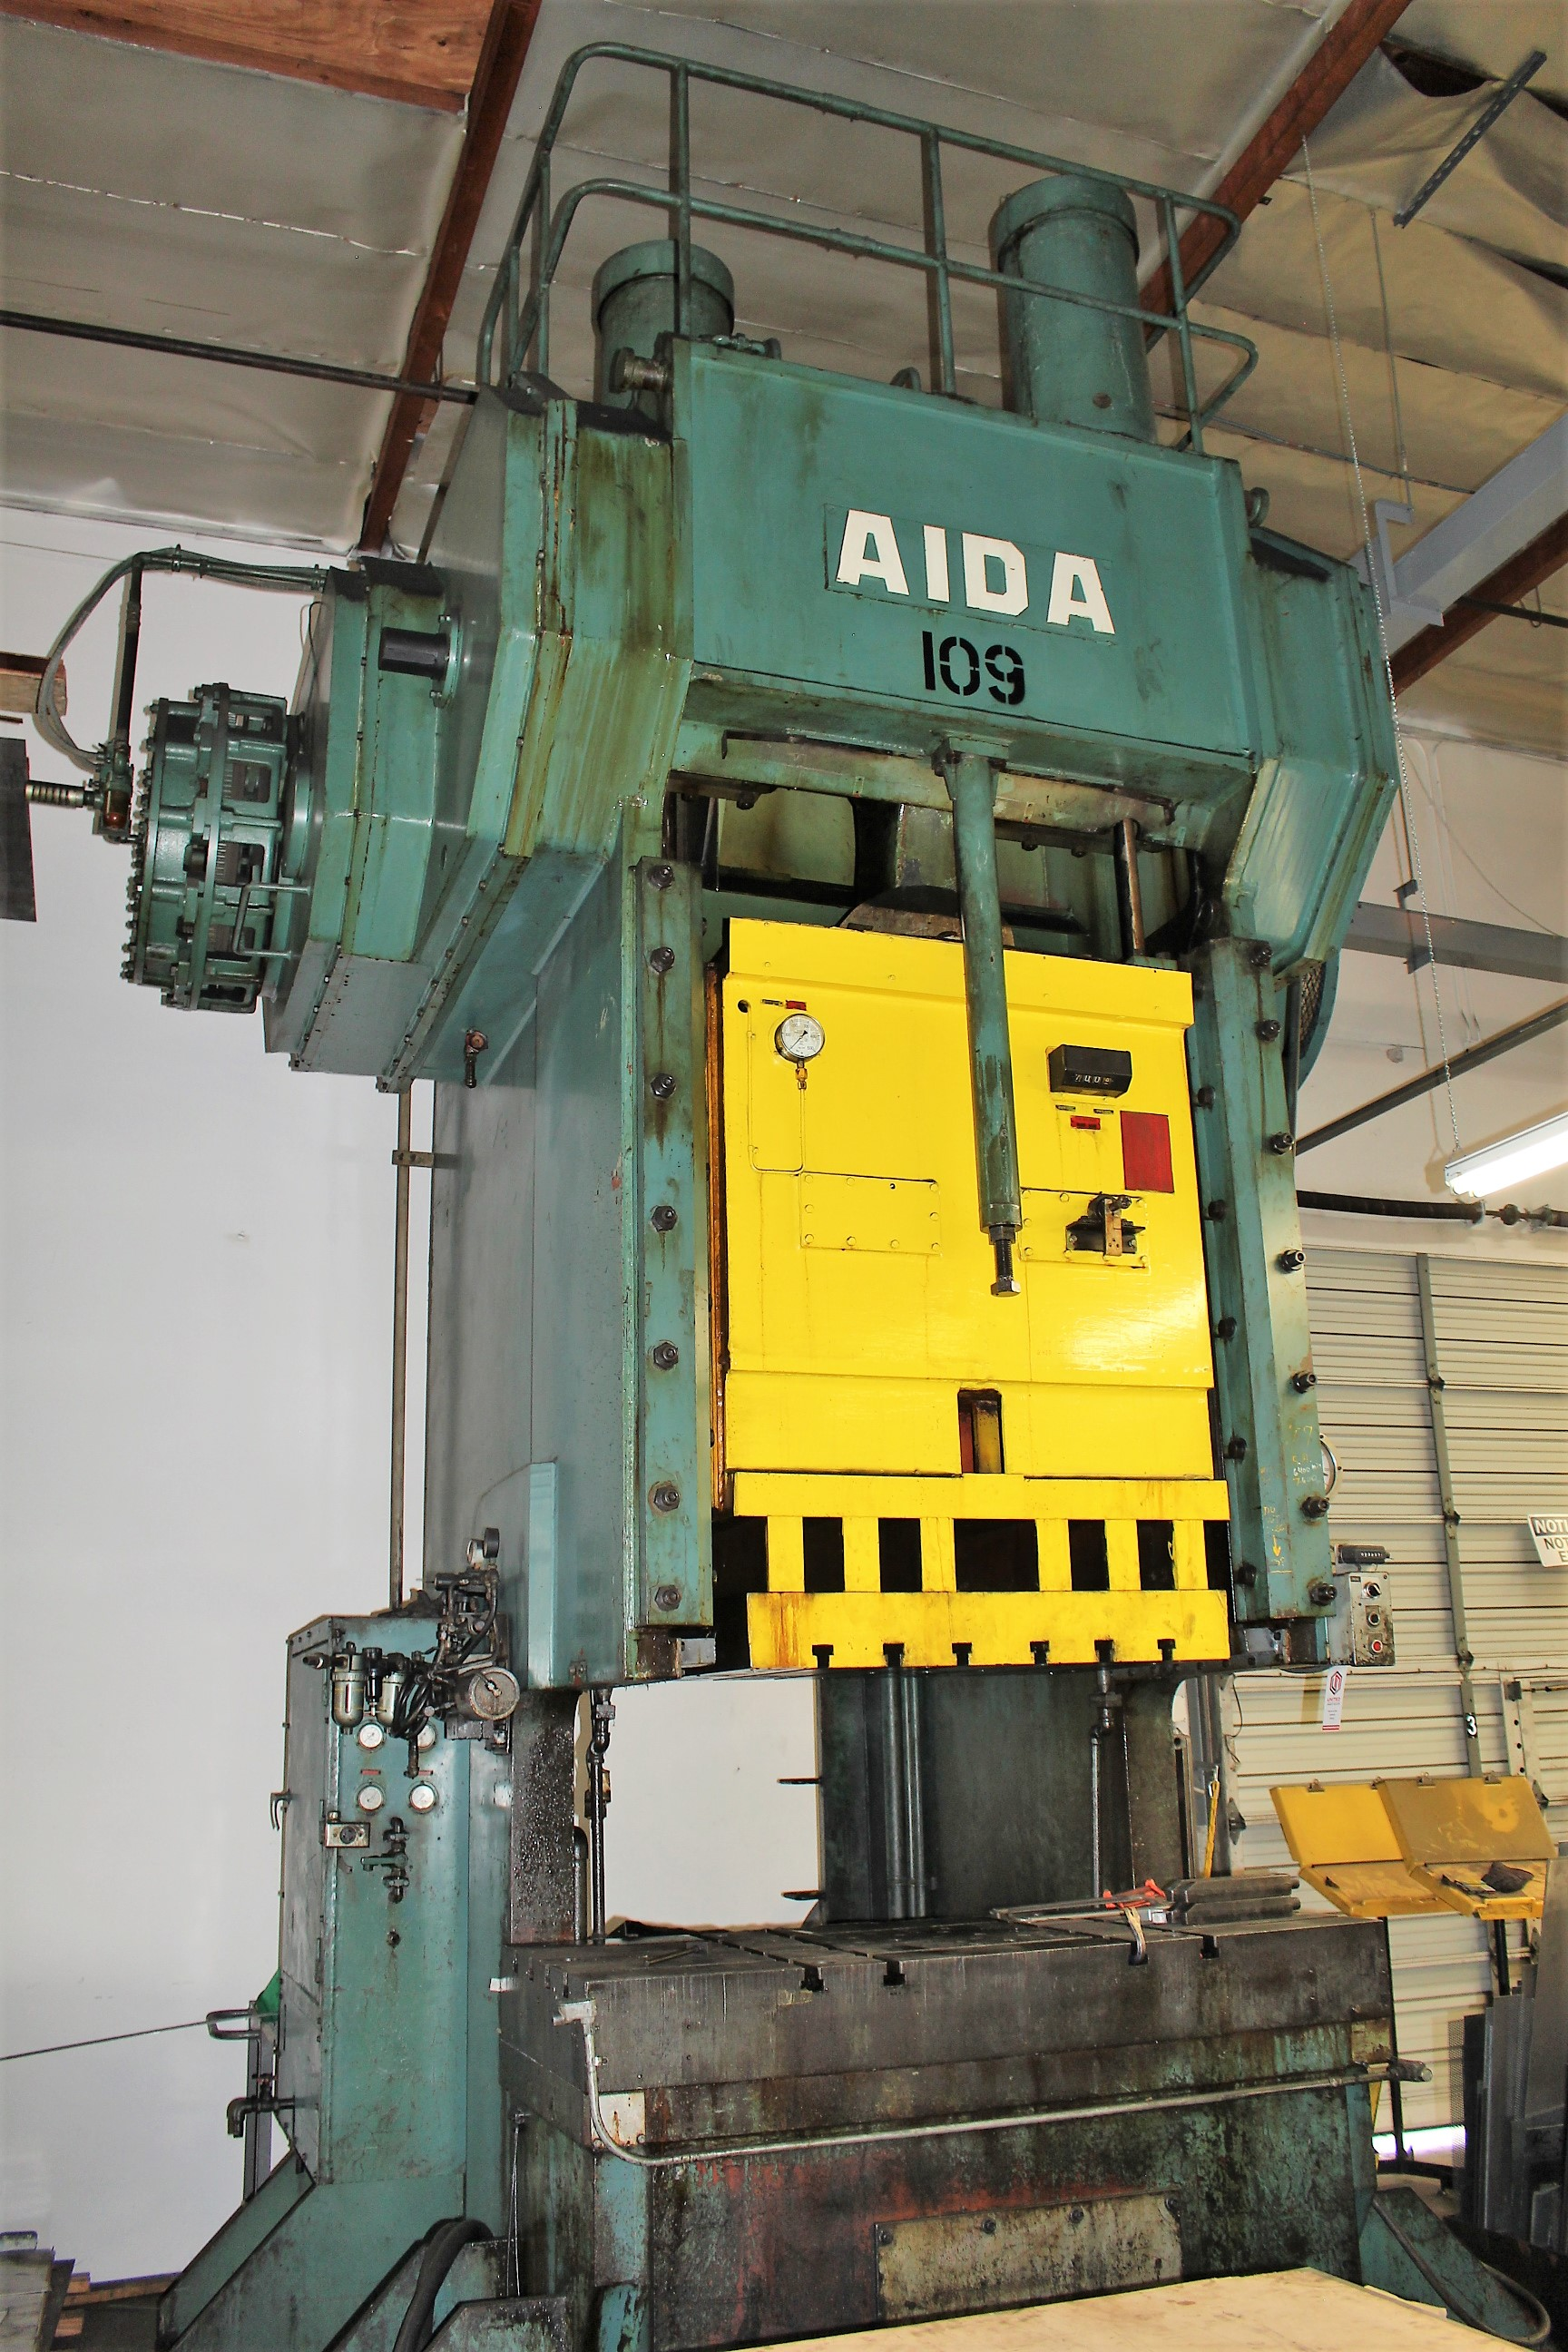 "AIDA MODEL PC-30 PUNCH PRESS, 300 TON CAPACITY,AIR CUSHION, 15.7"" STROKE, 30 SPM, 70"" X 30"" - Image 9 of 21"